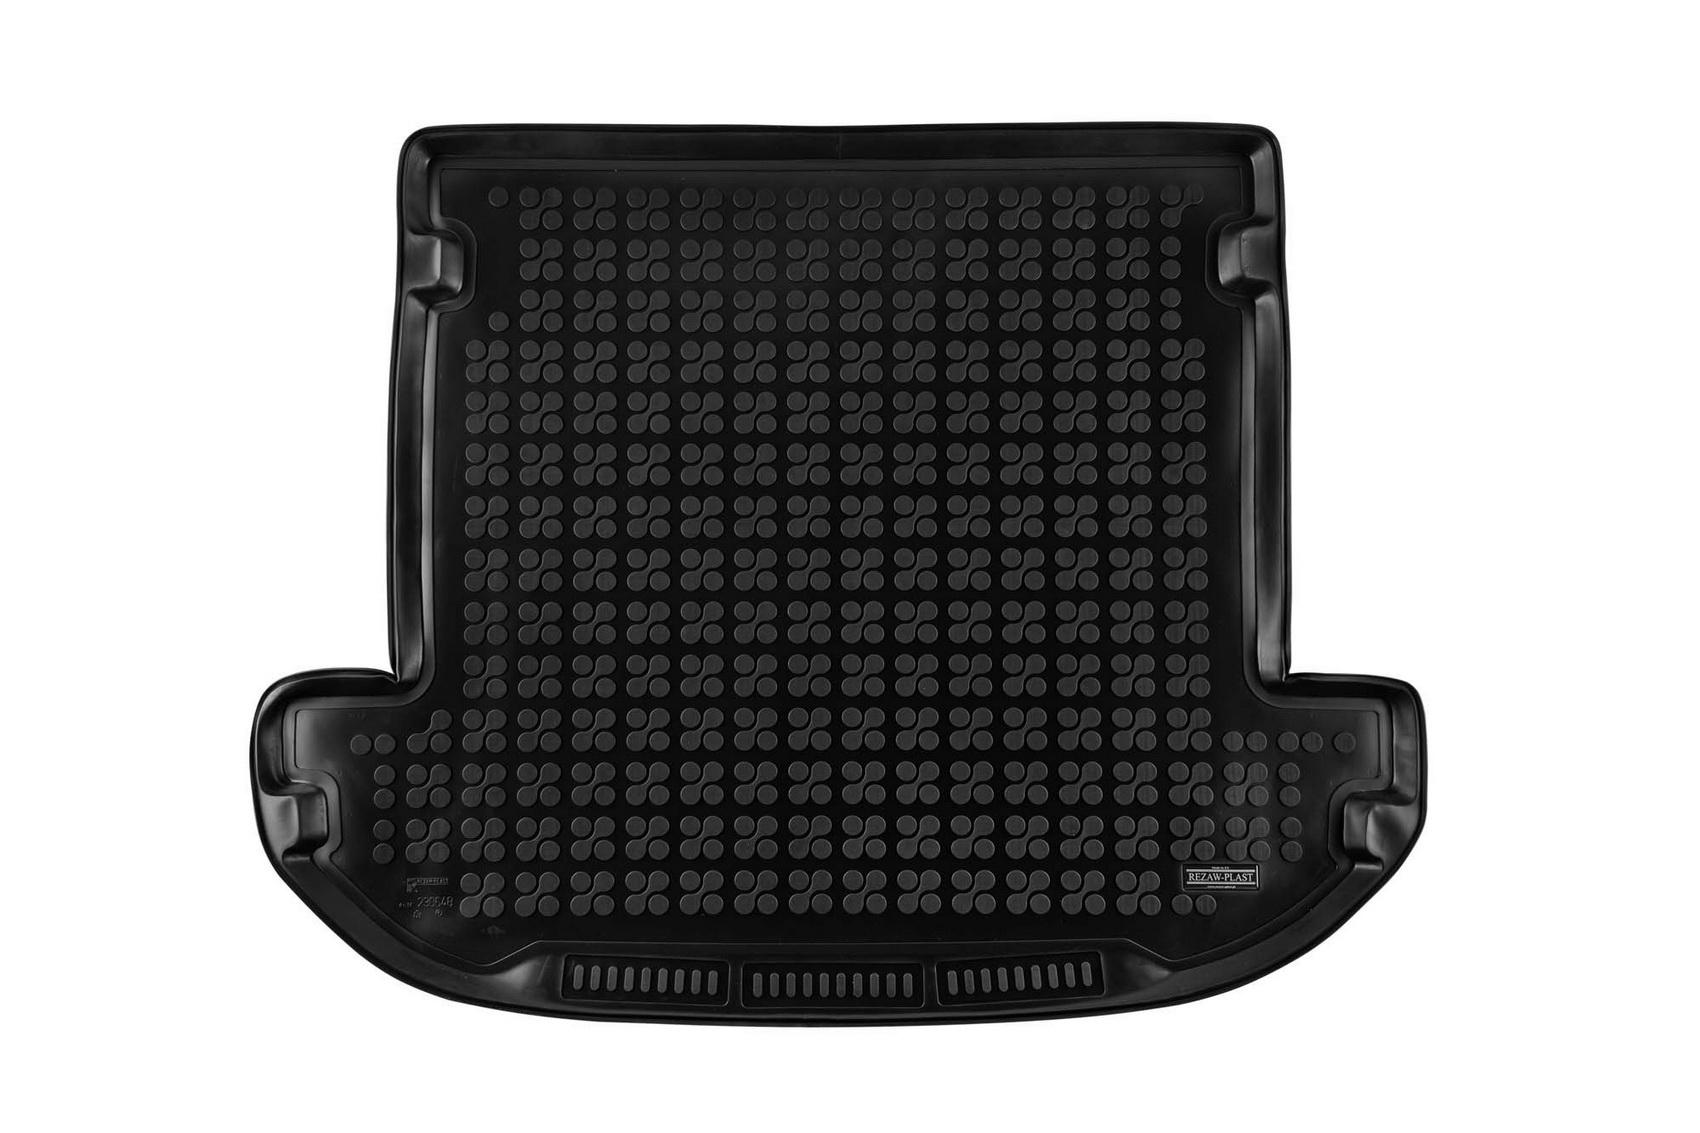 Covoras Tavita portbagaj compatibil cu Hyundai SANTE Fe IV TM 7 locuri (2018-) Negru